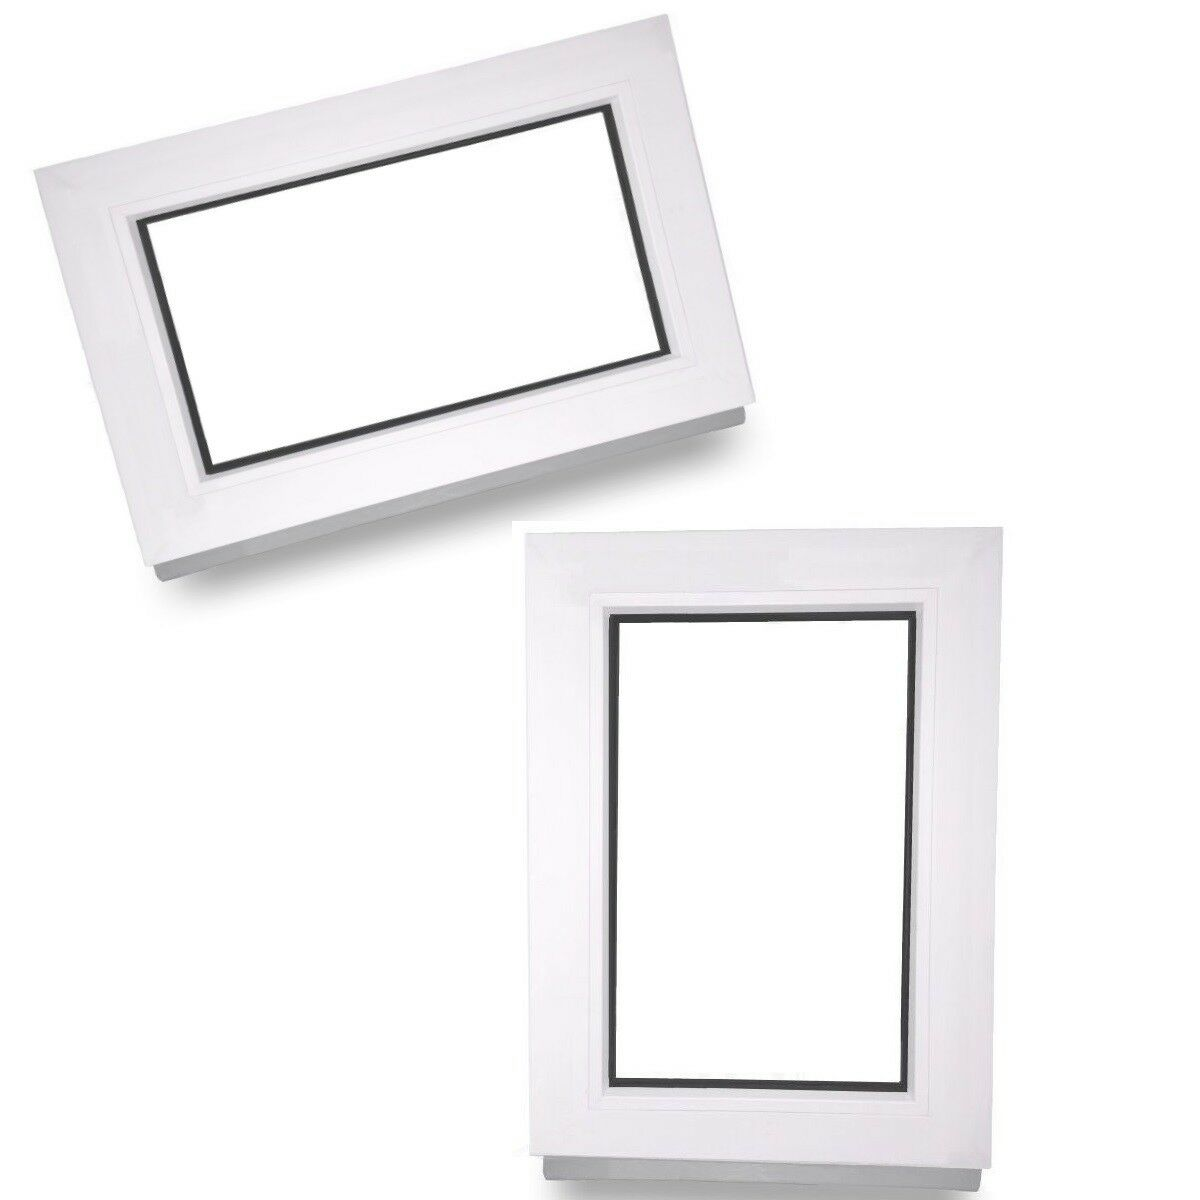 Kunststofffenster Fenster Festverglasung Festelement Isolierglas alle Größen